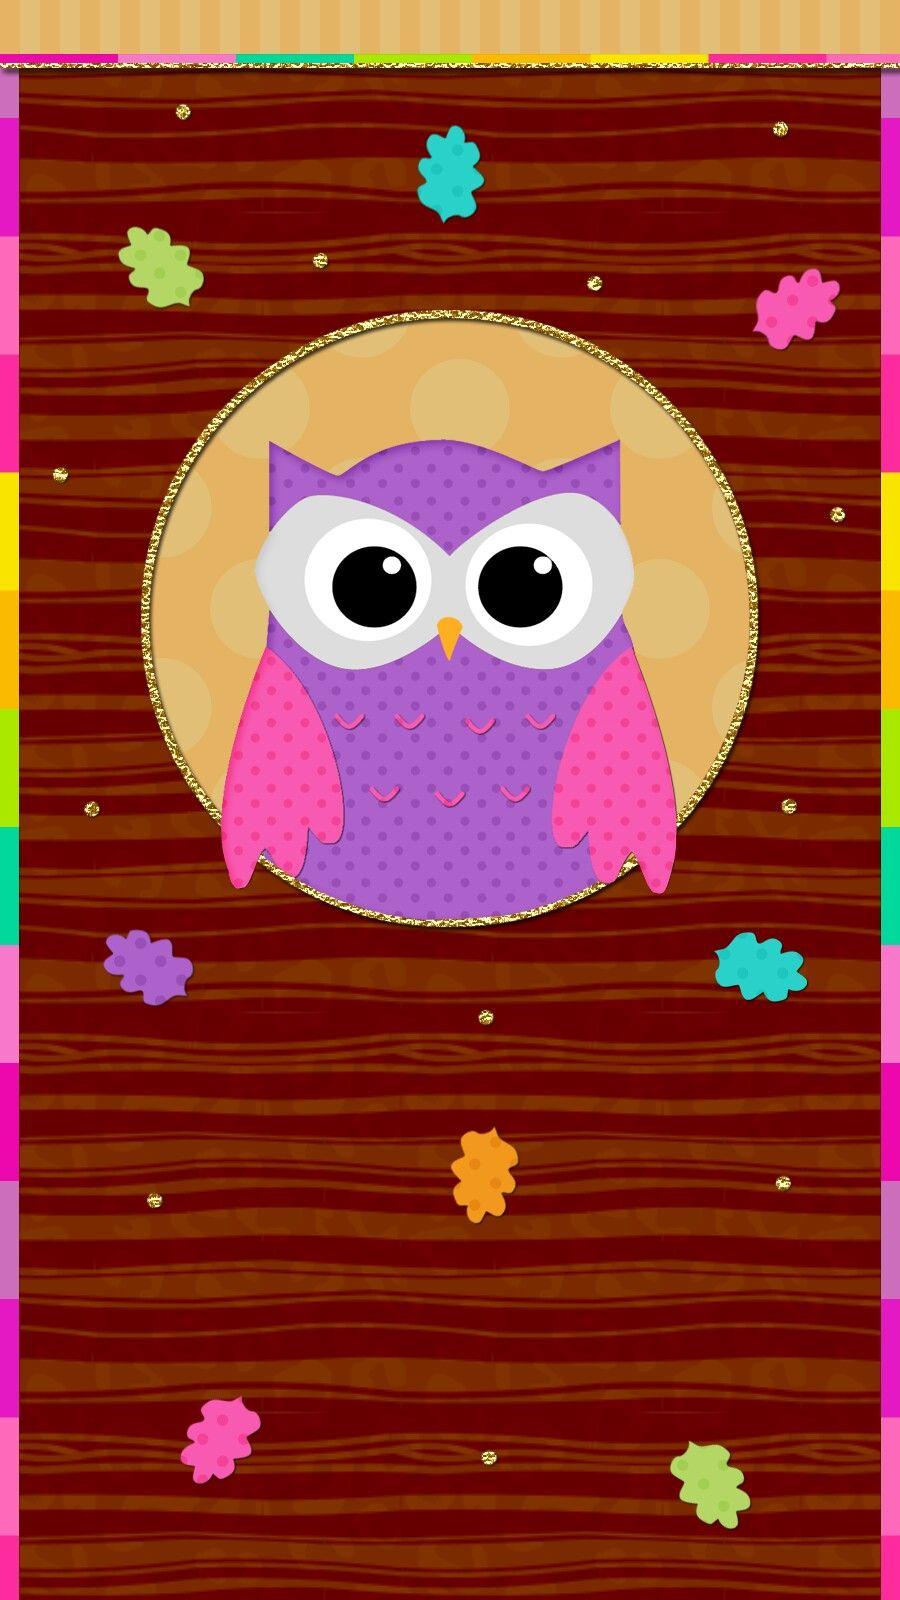 Iphone Wall Tjn Owl Wallpaper Iphone Owl Wallpaper Cute Wallpapers